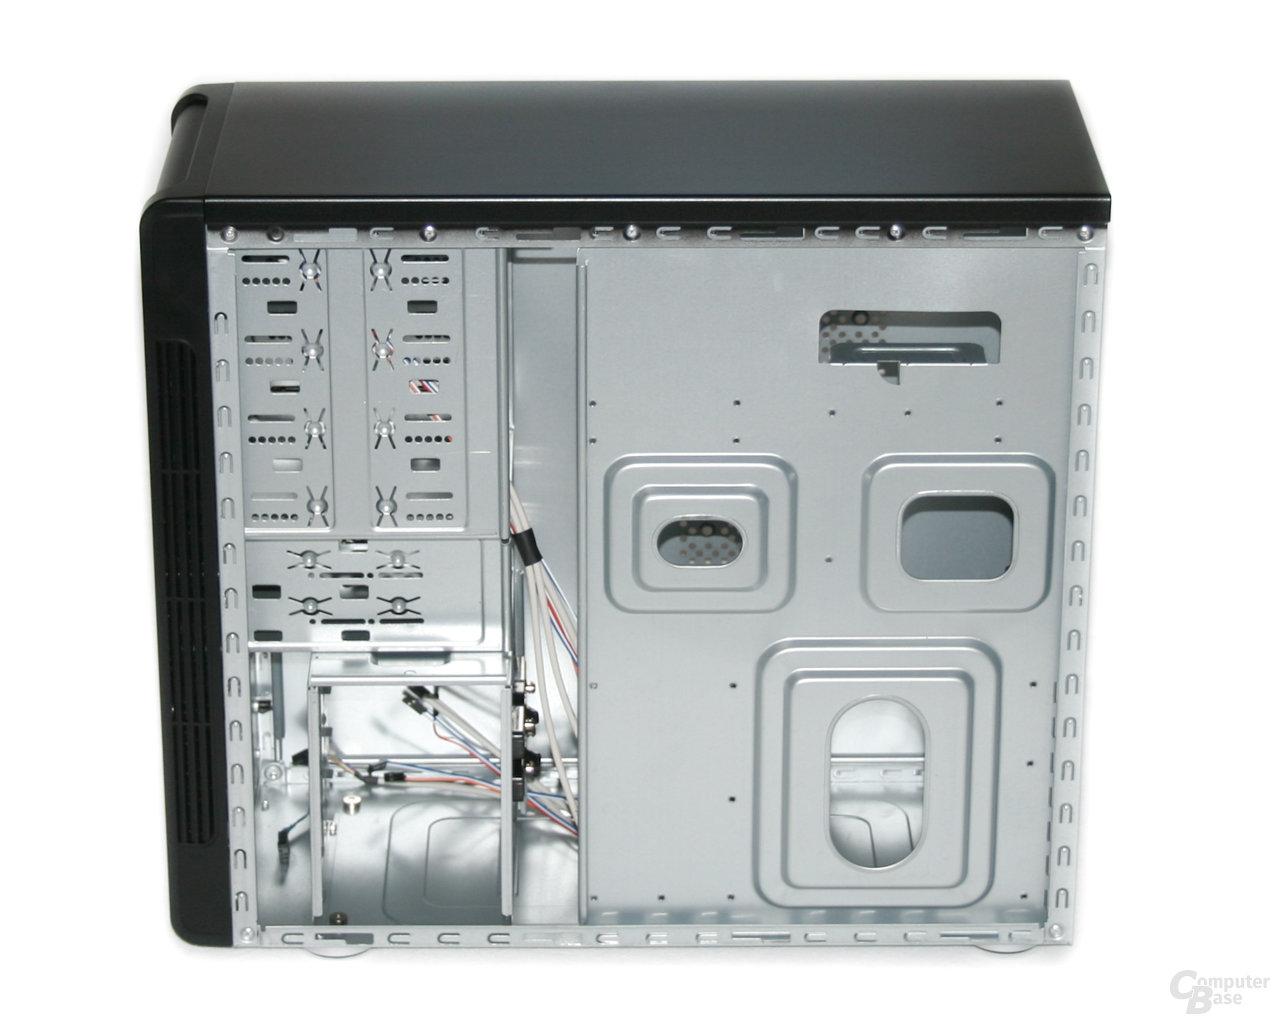 Cooltek CT-K4 – Innenansicht rechts